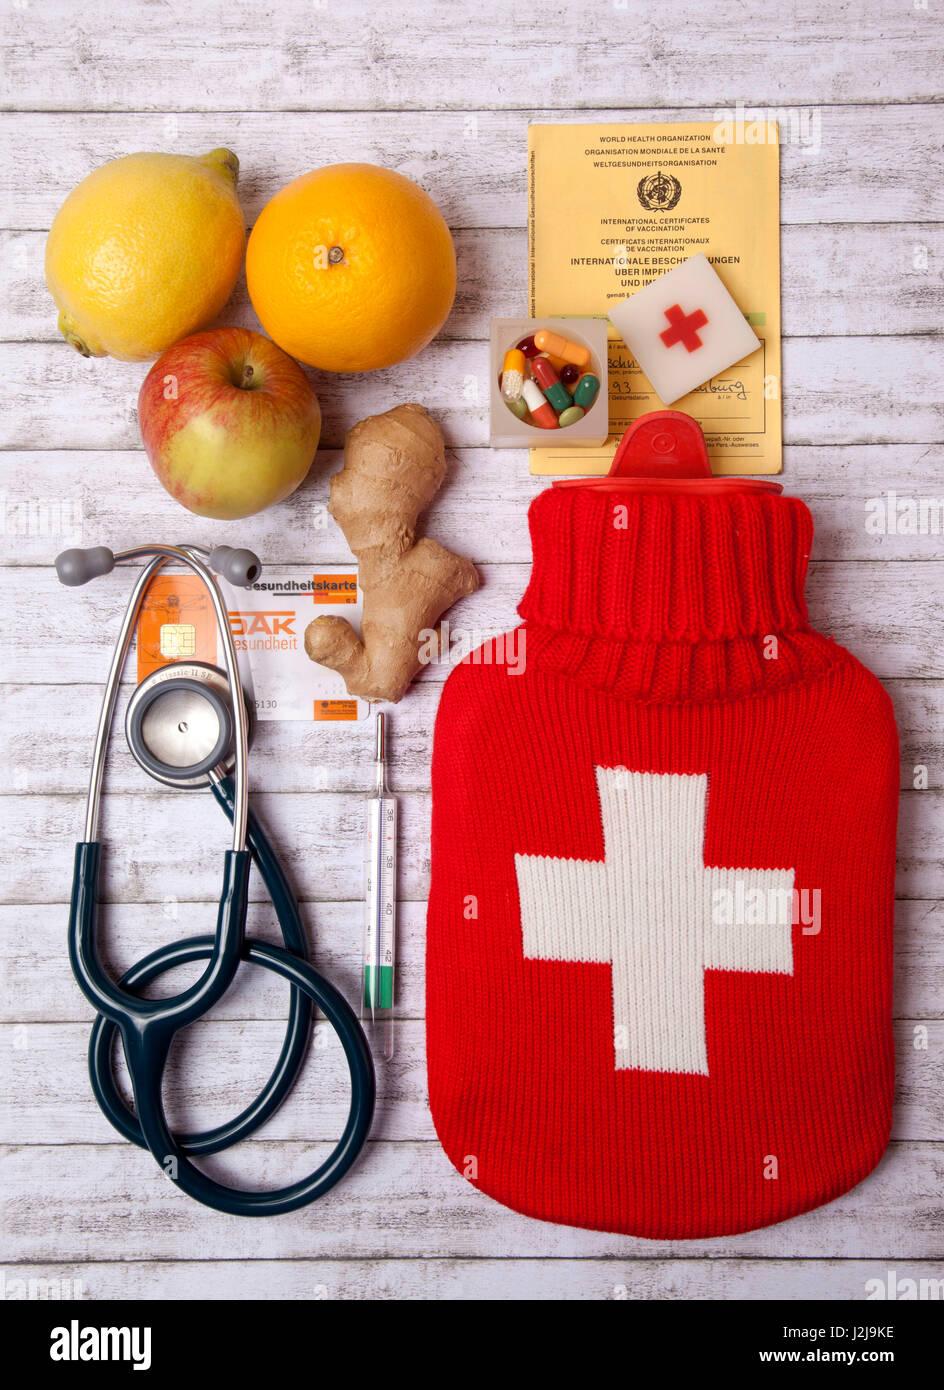 Precaution, medicine, health, public health - Stock Image